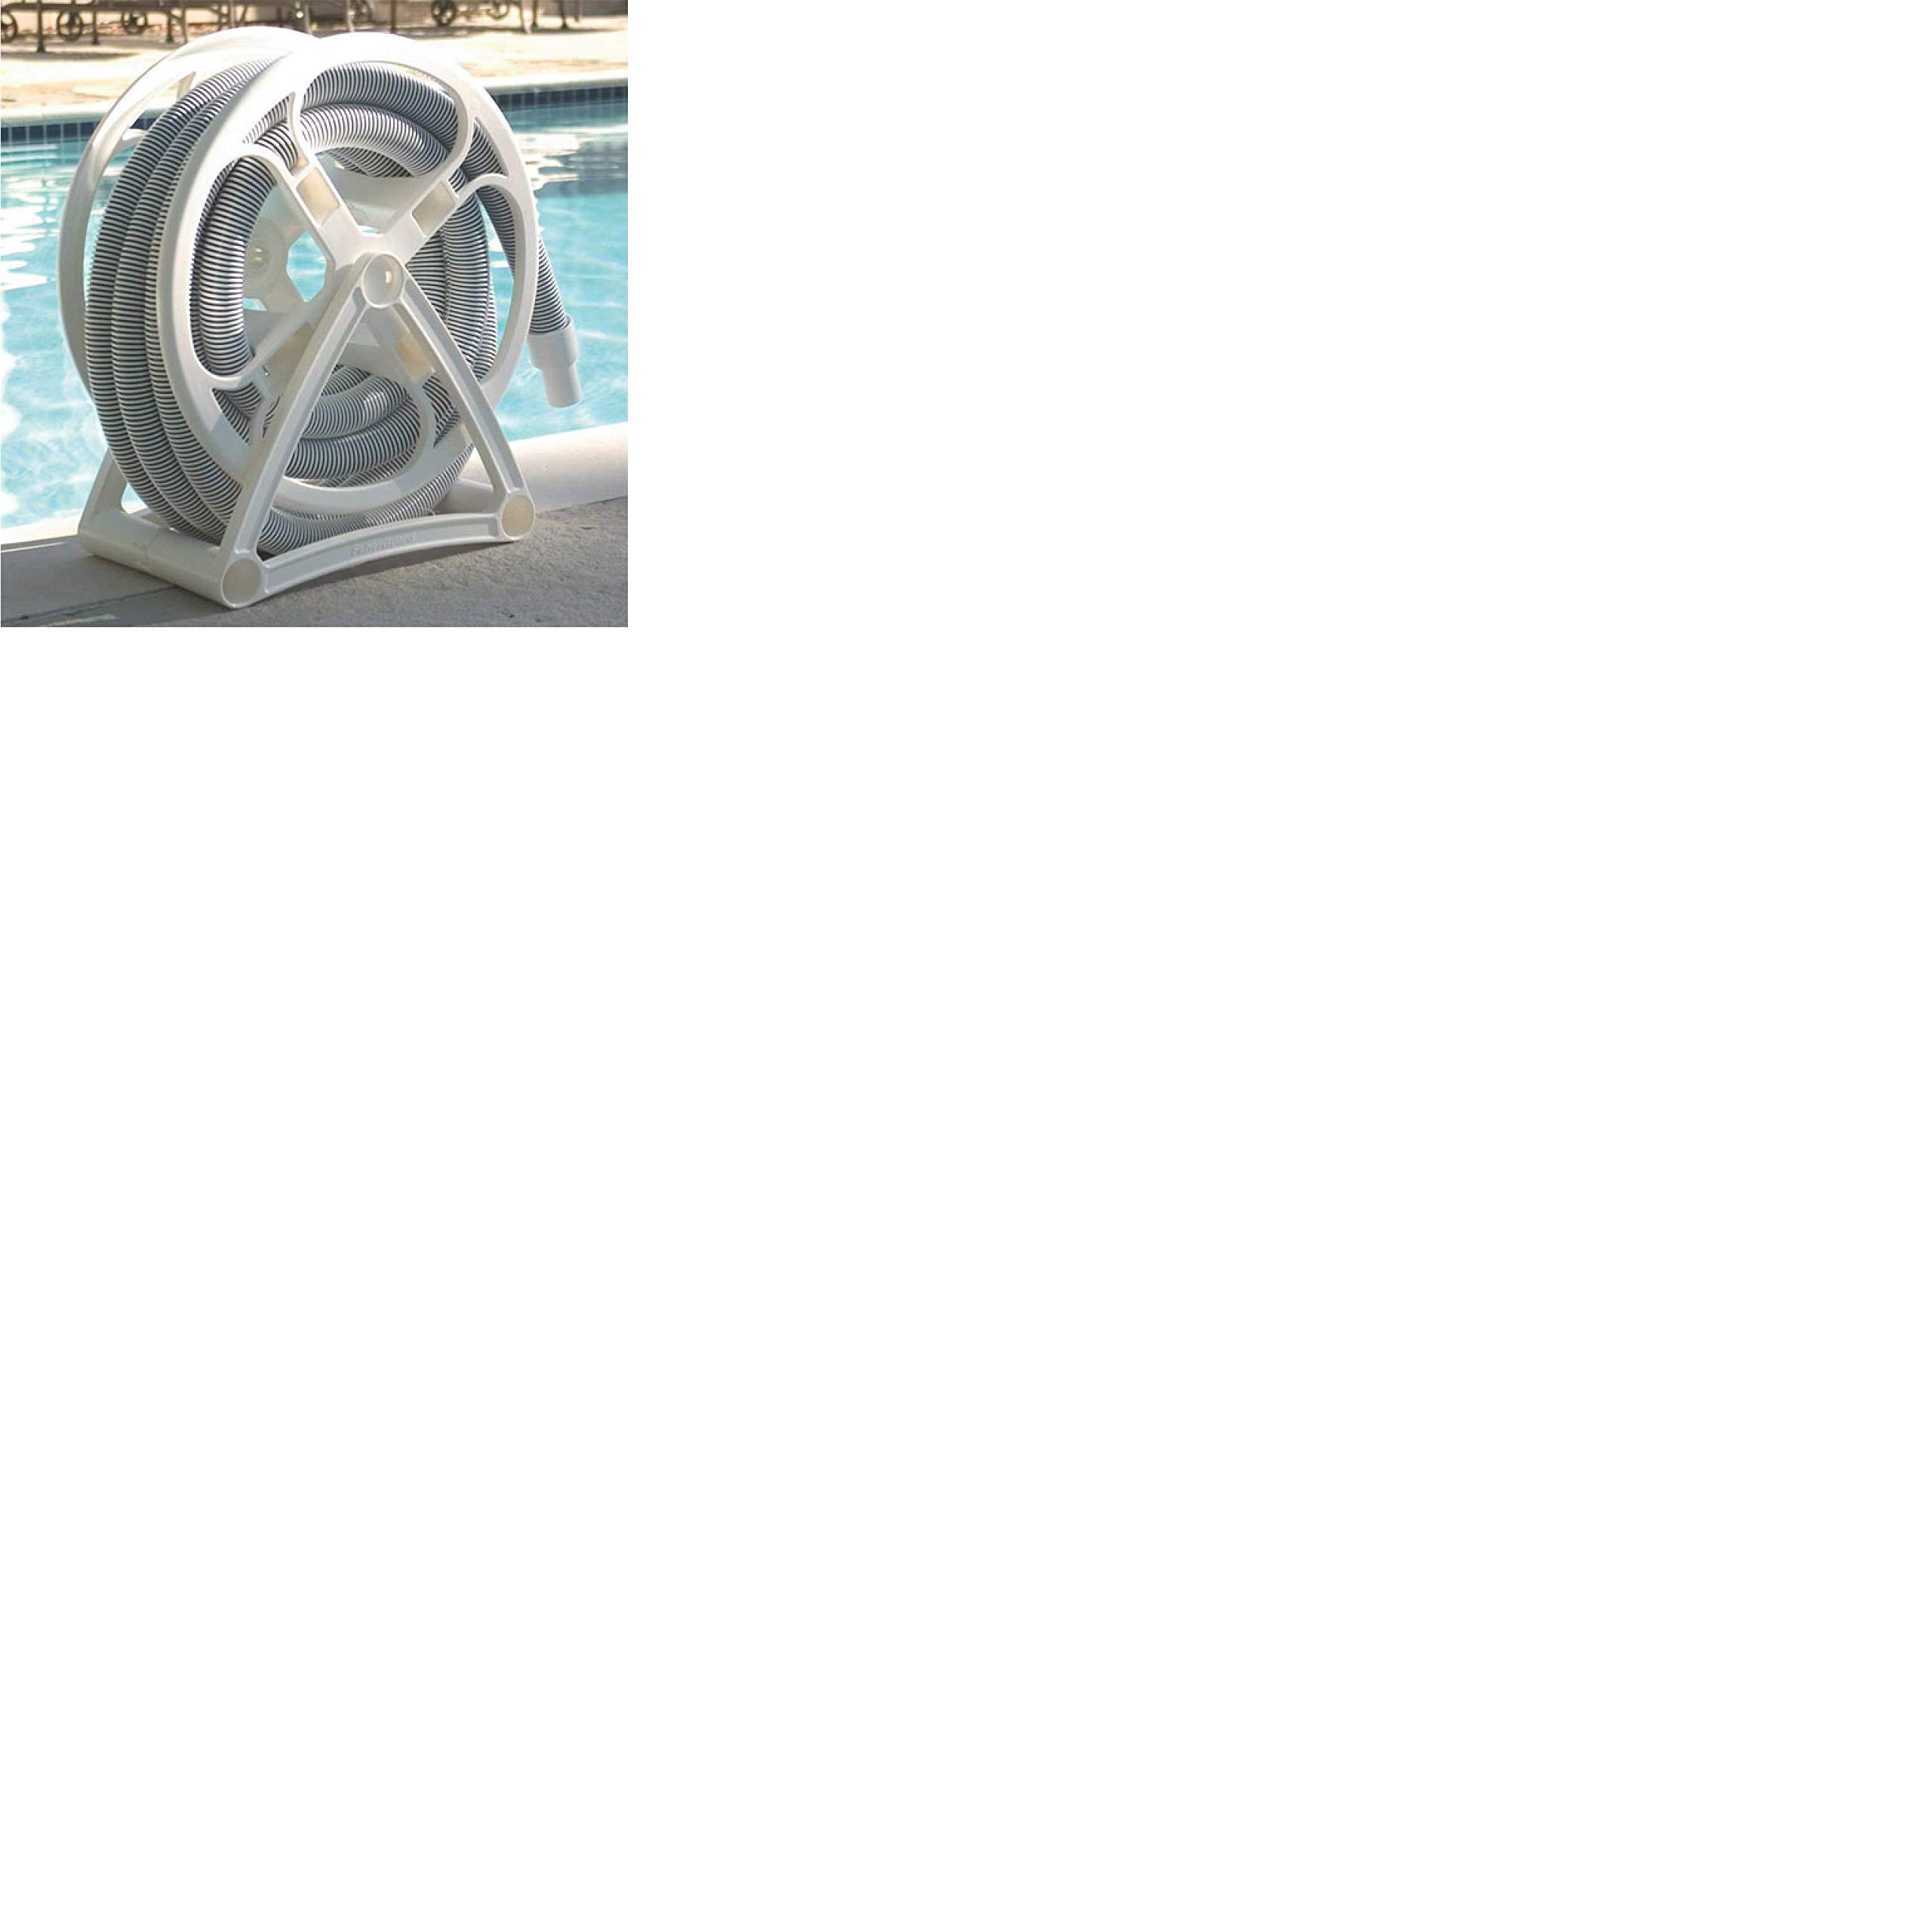 Feherguard Swimming Pool Vacuum Hose Storage Reel by Fehreguard